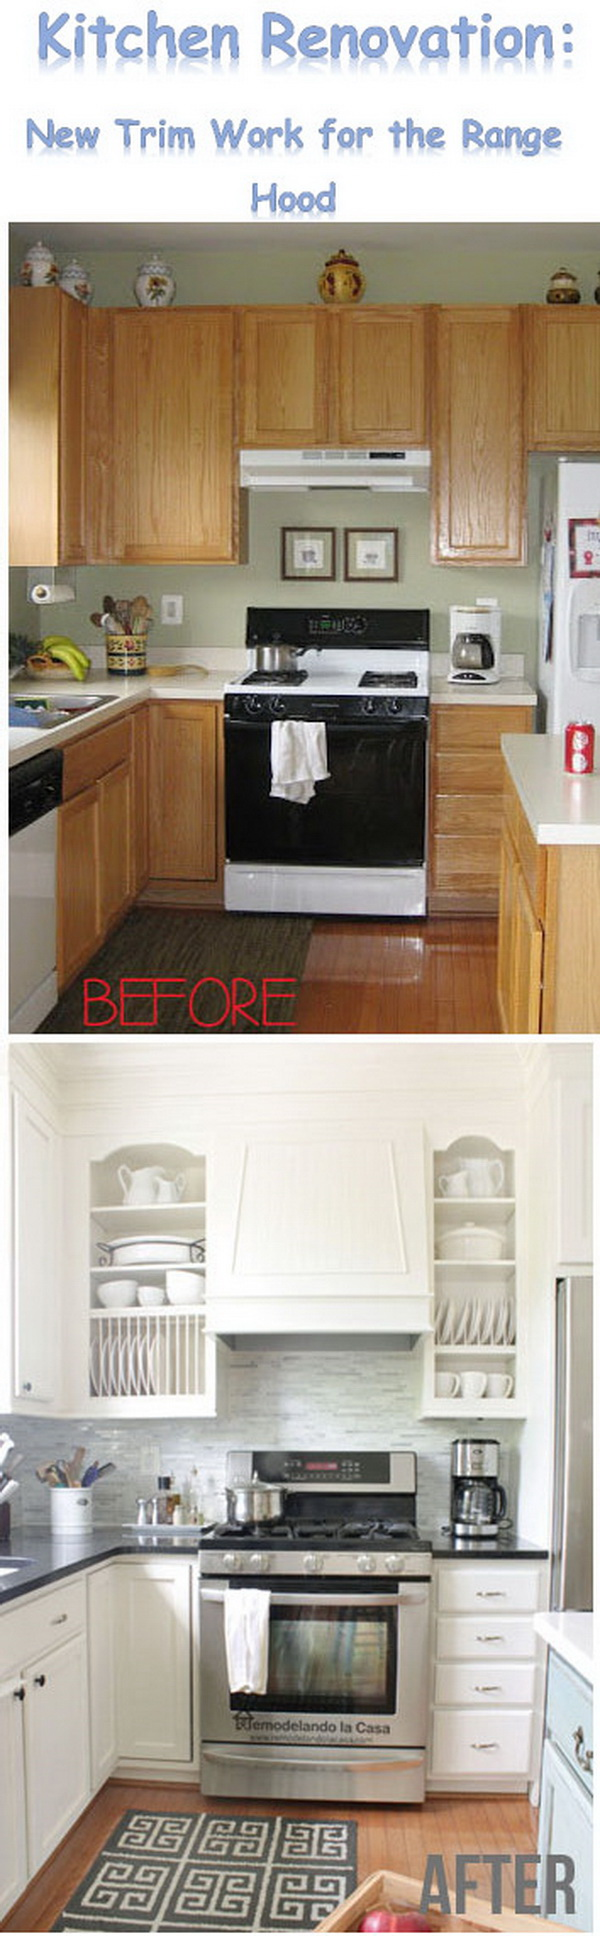 Kitchen Renovation: New Trim Work for the Range Hood.